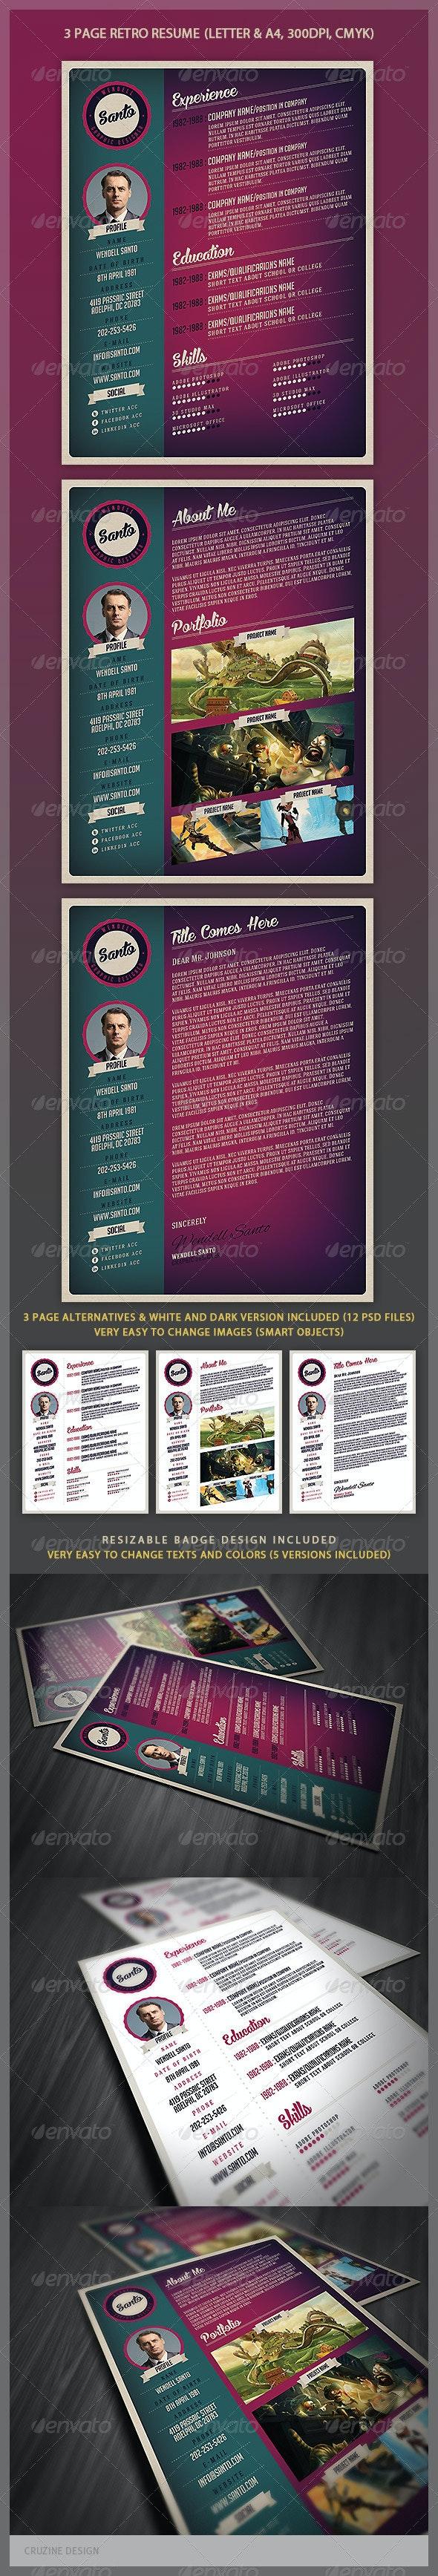 Retro Style Resume - Resumes Stationery